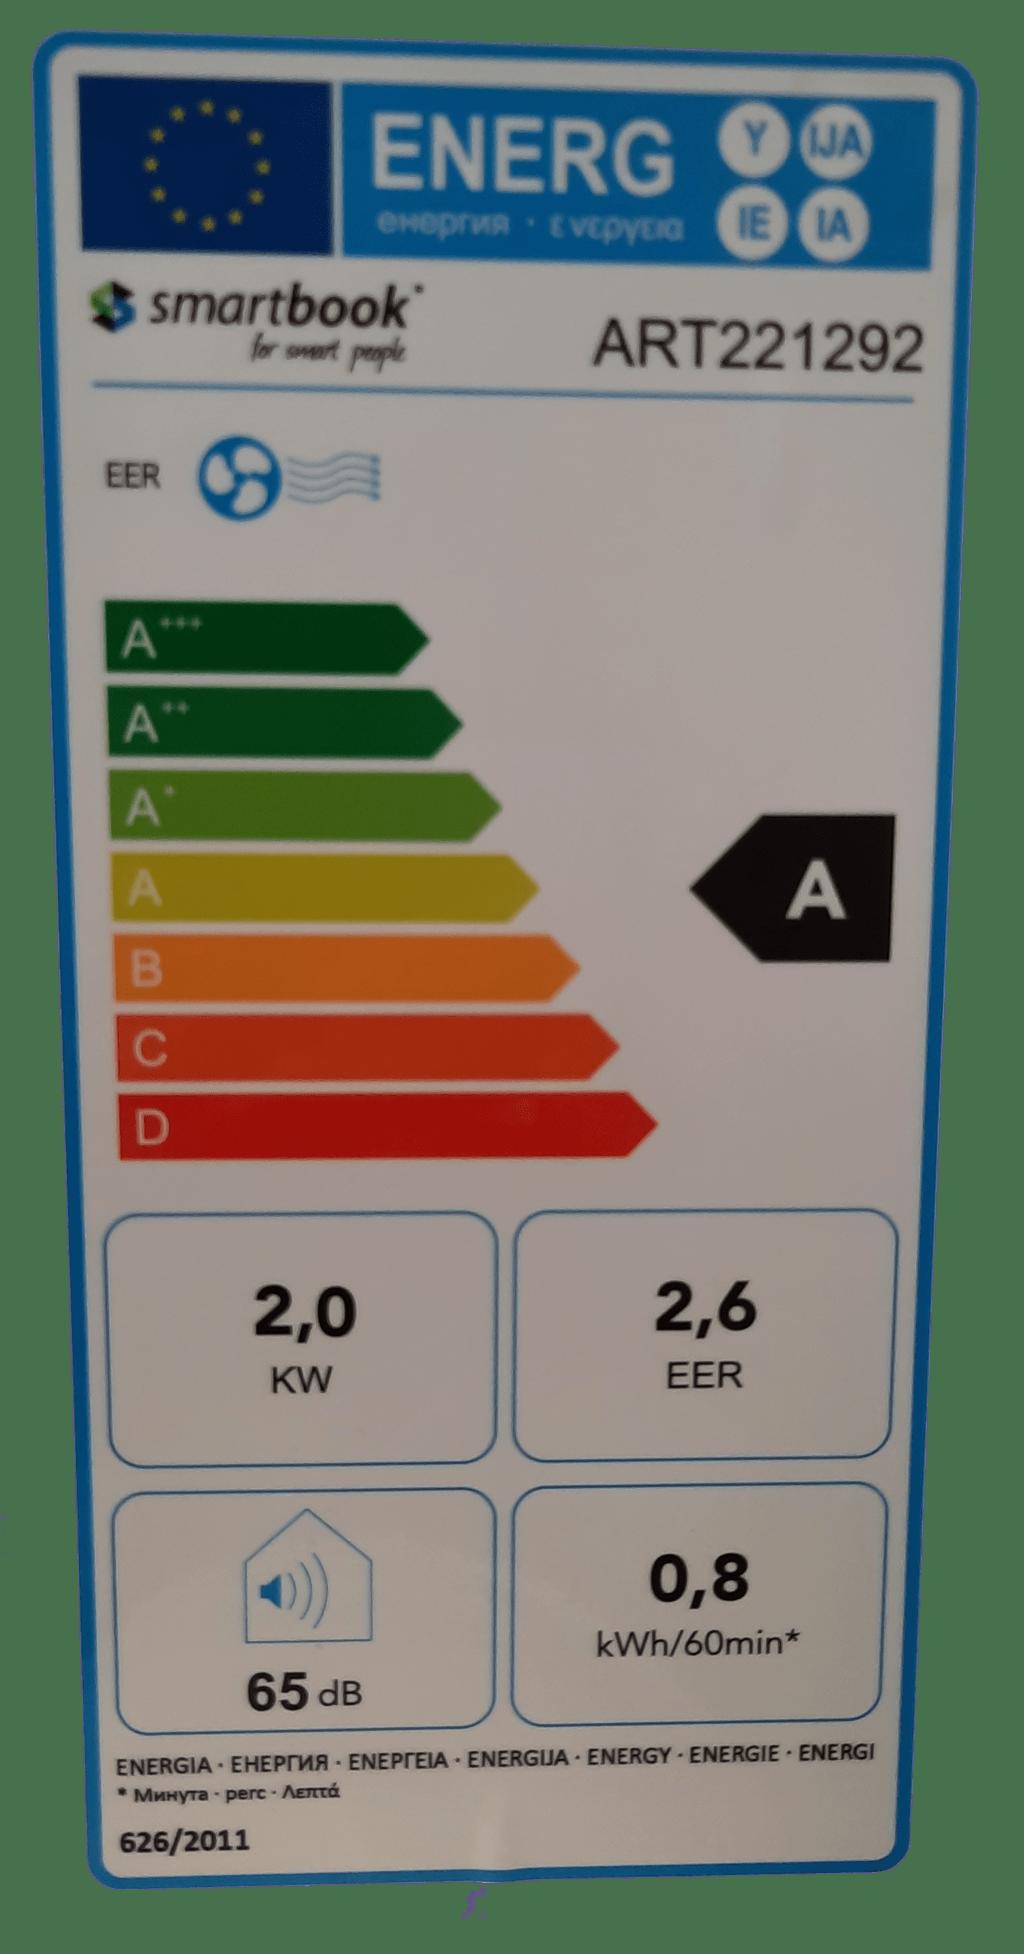 Energieklasse-Klima